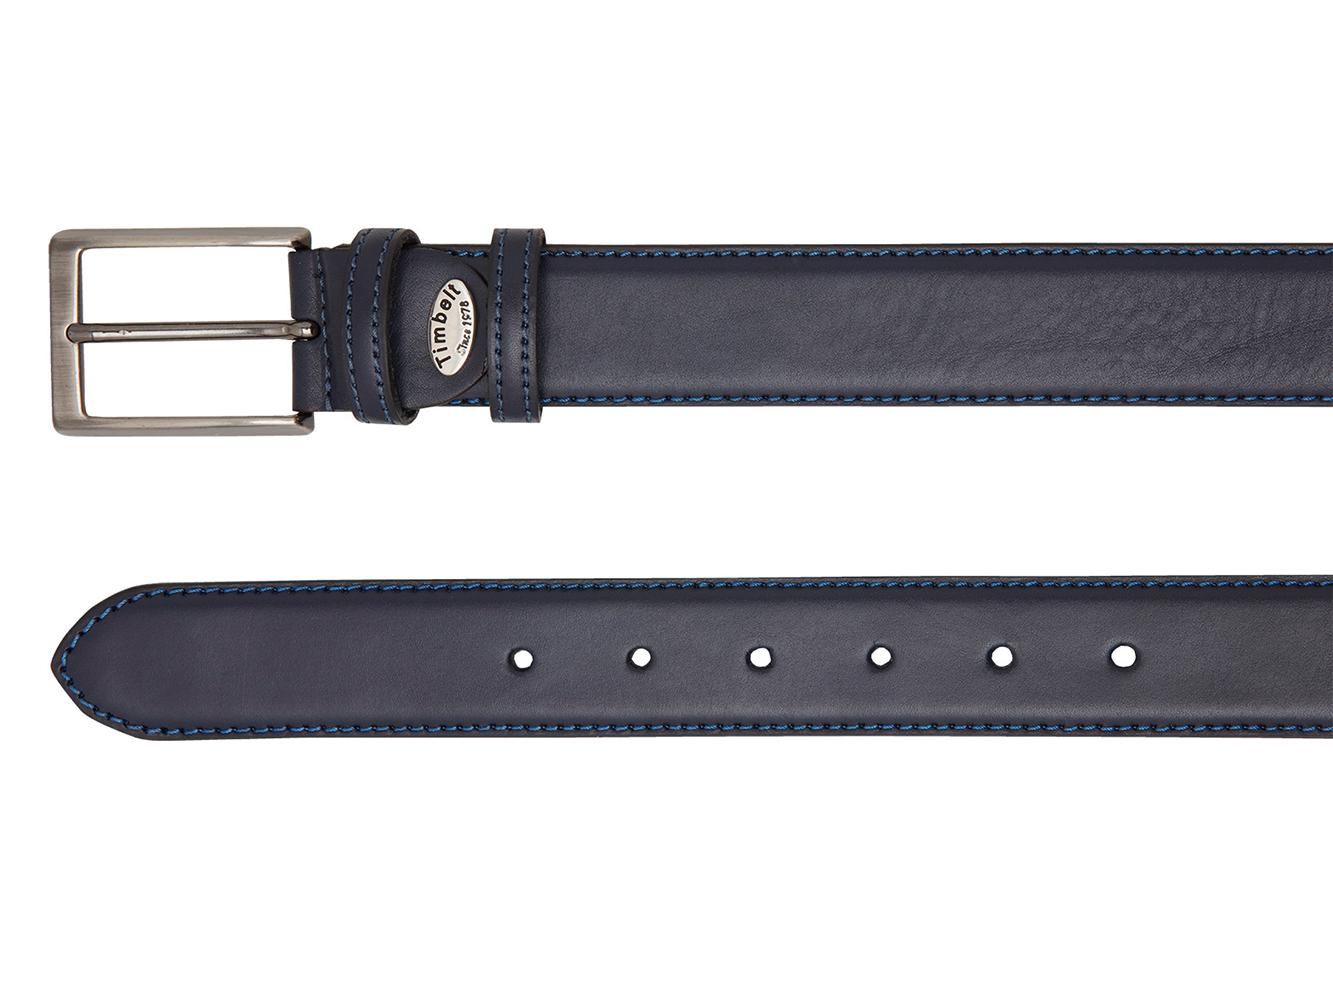 Timbelt 35577 Heren Volnerf Leren Pantalon Riem 105/3,5 cm Navy-Blauw